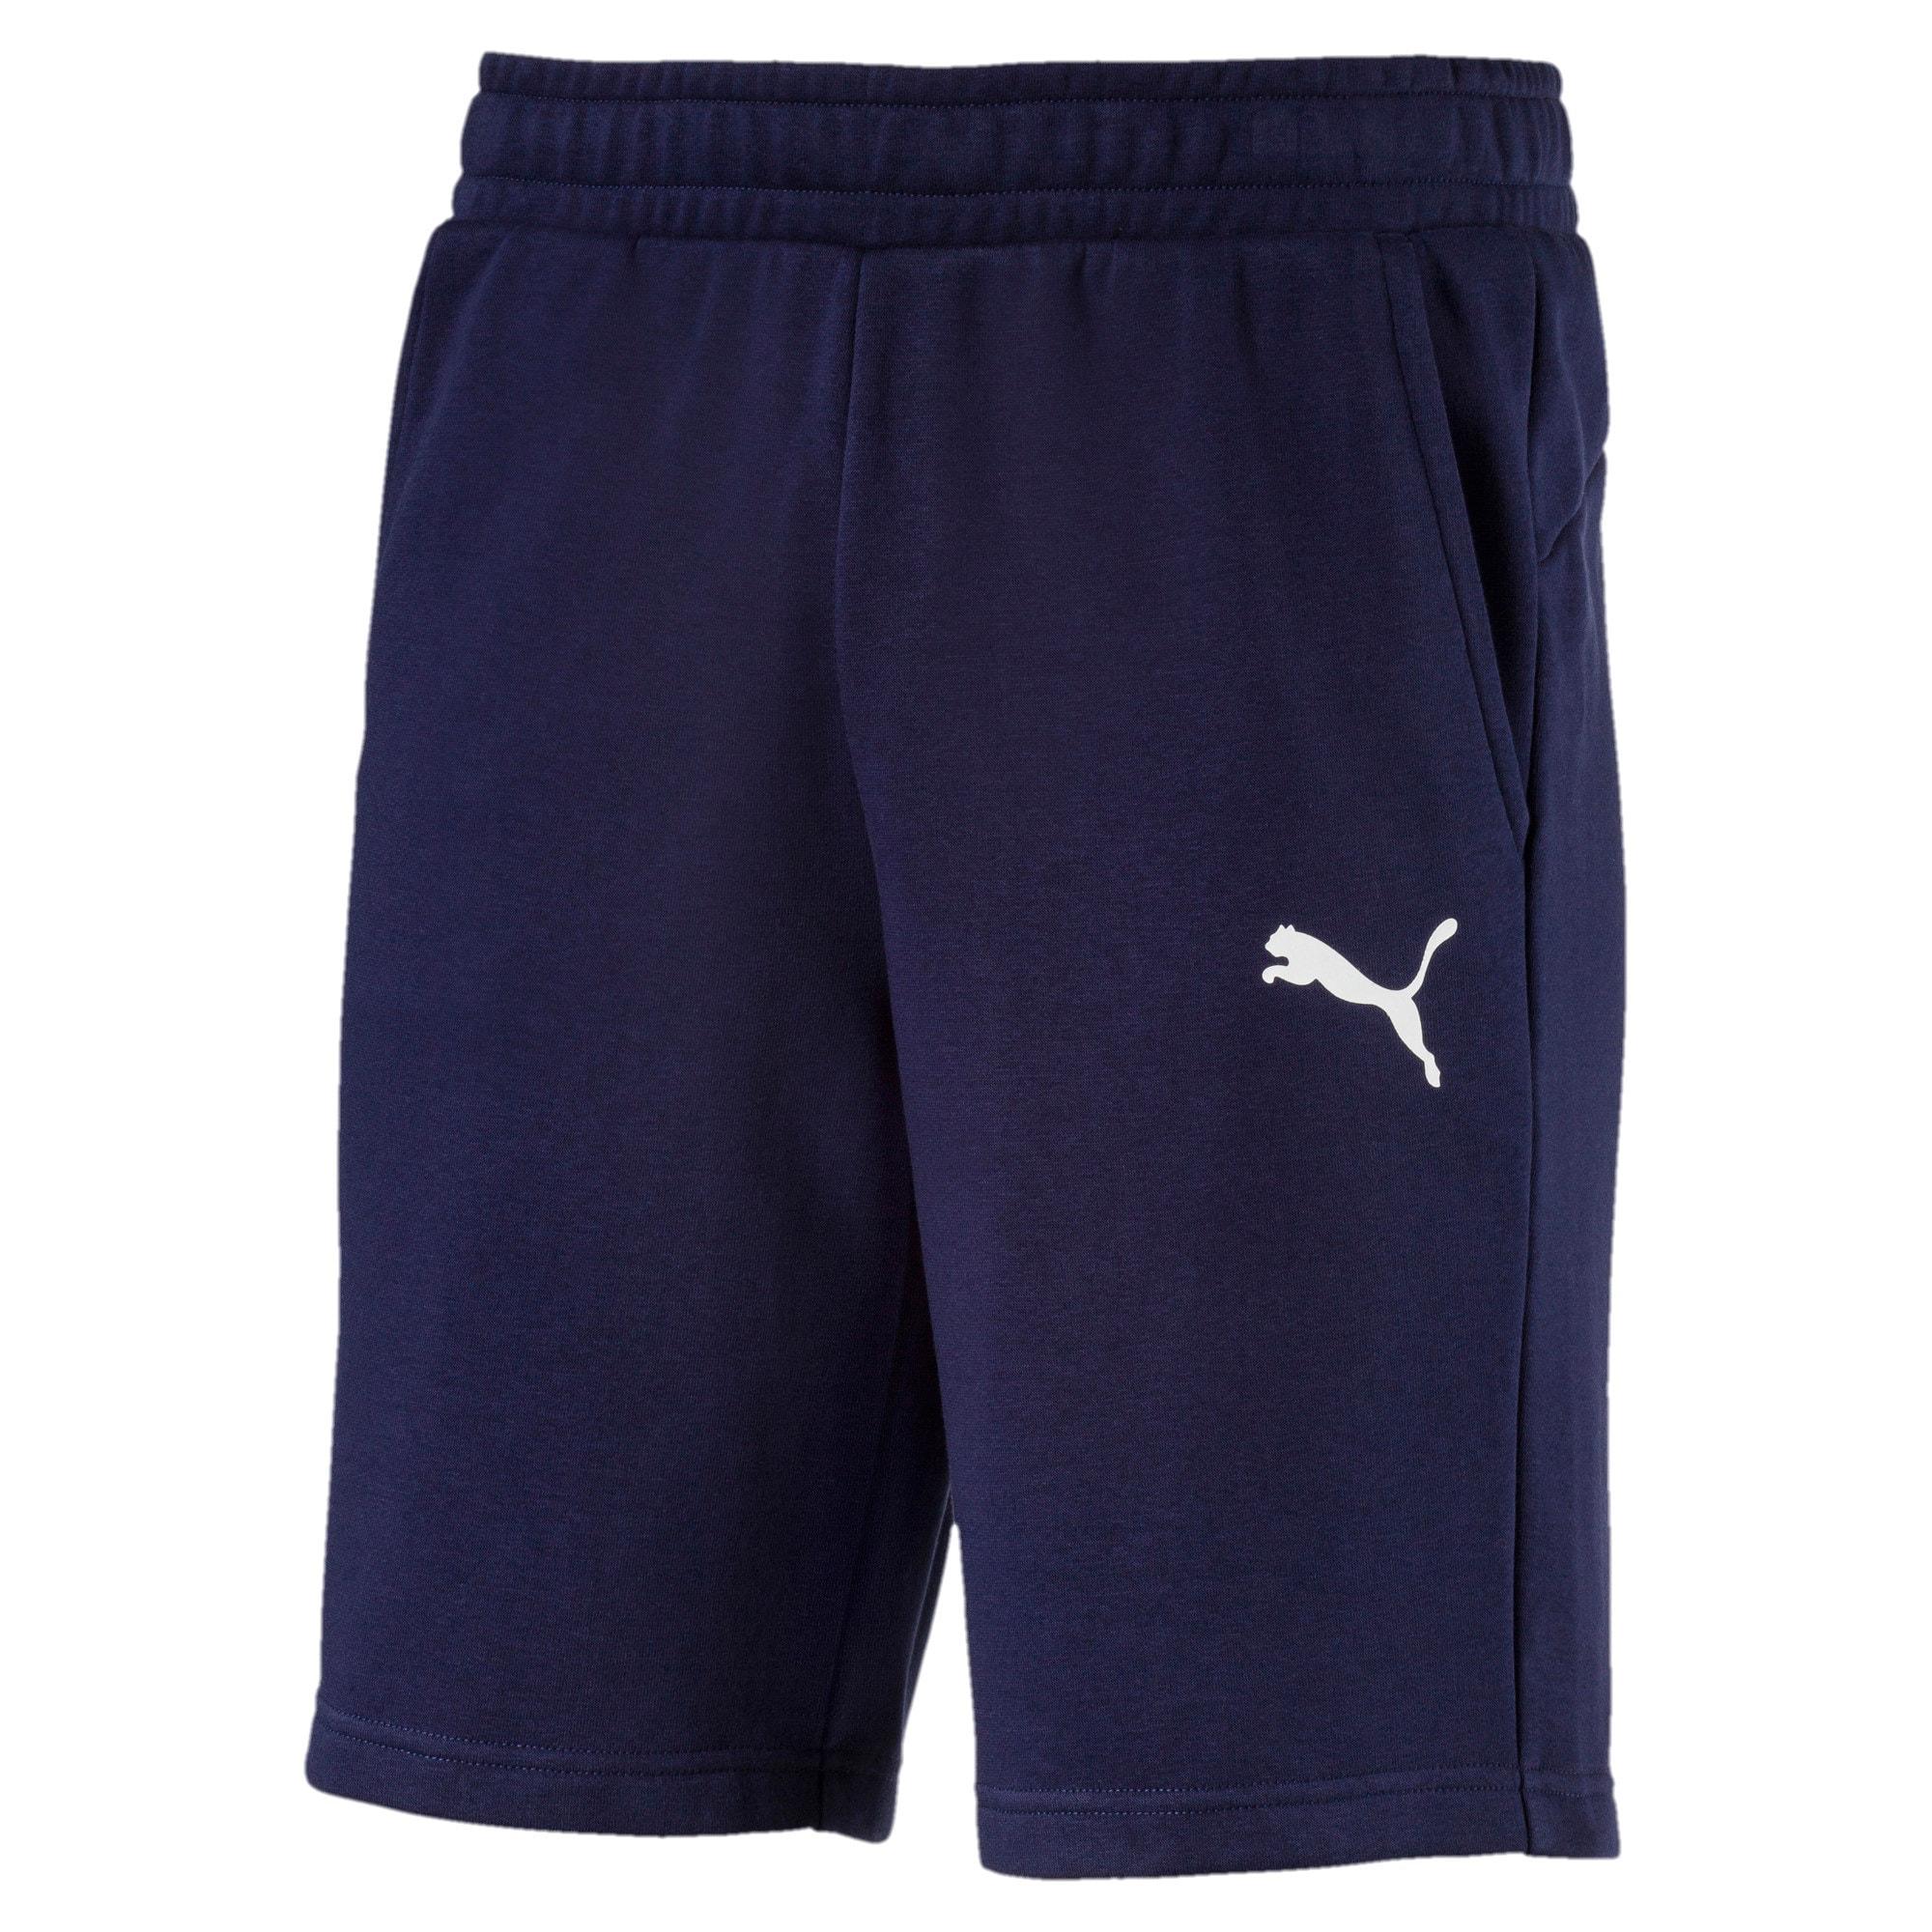 Thumbnail 1 of Essentials Men's Sweat Shorts, Peacoat-Cat, medium